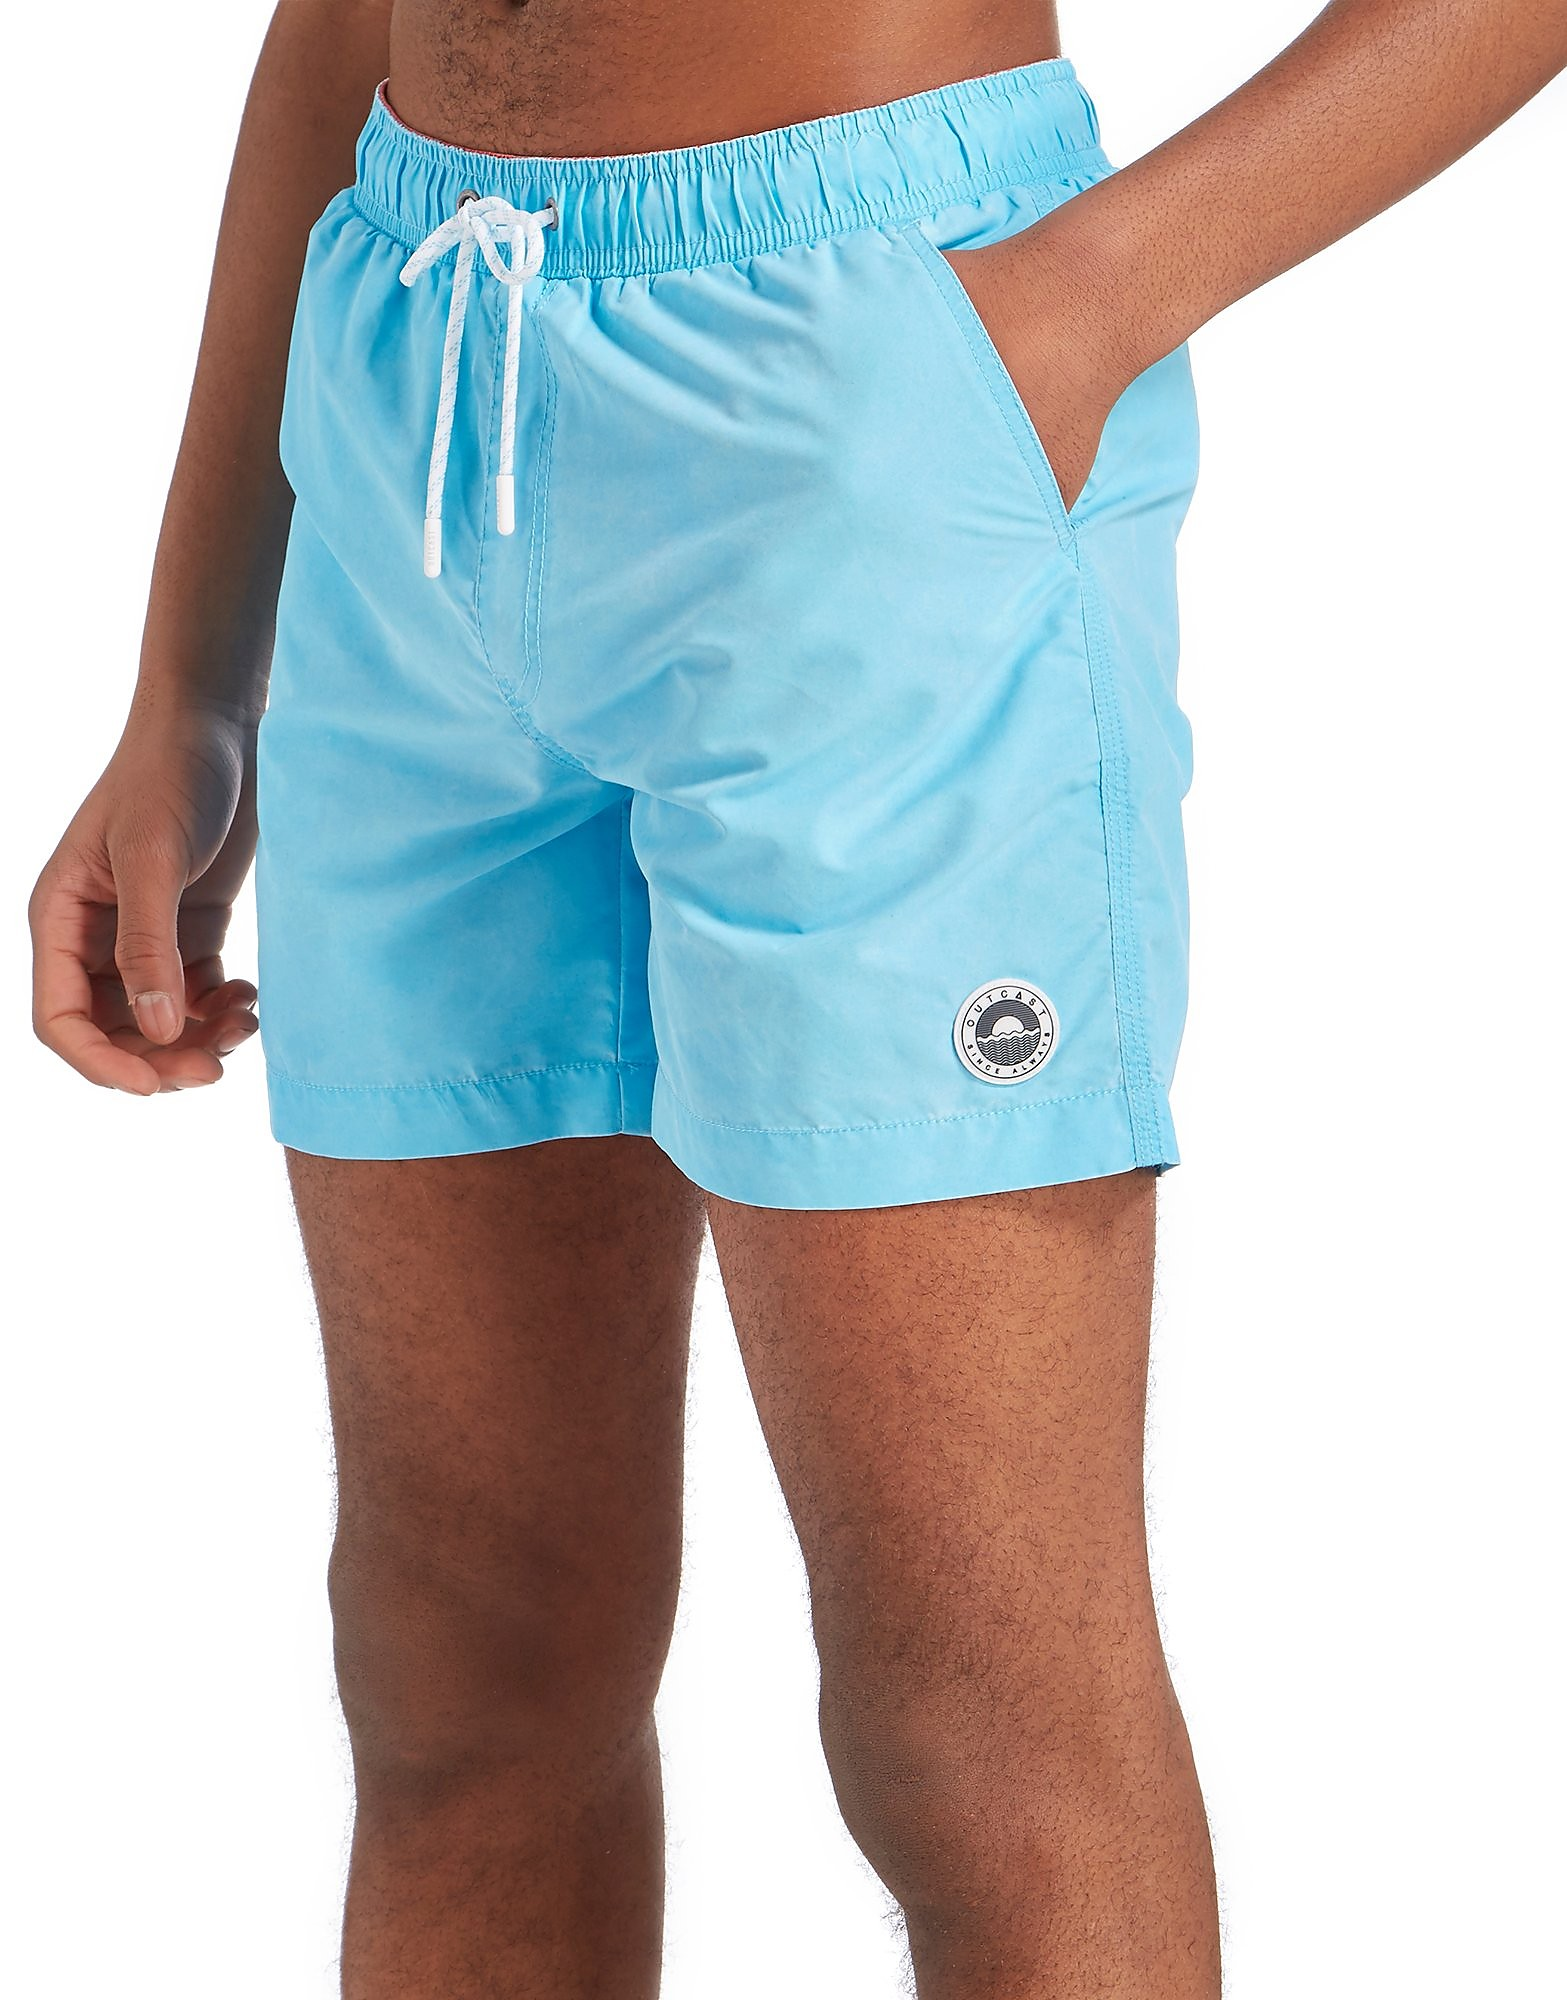 Outcast Rad Swim Shorts